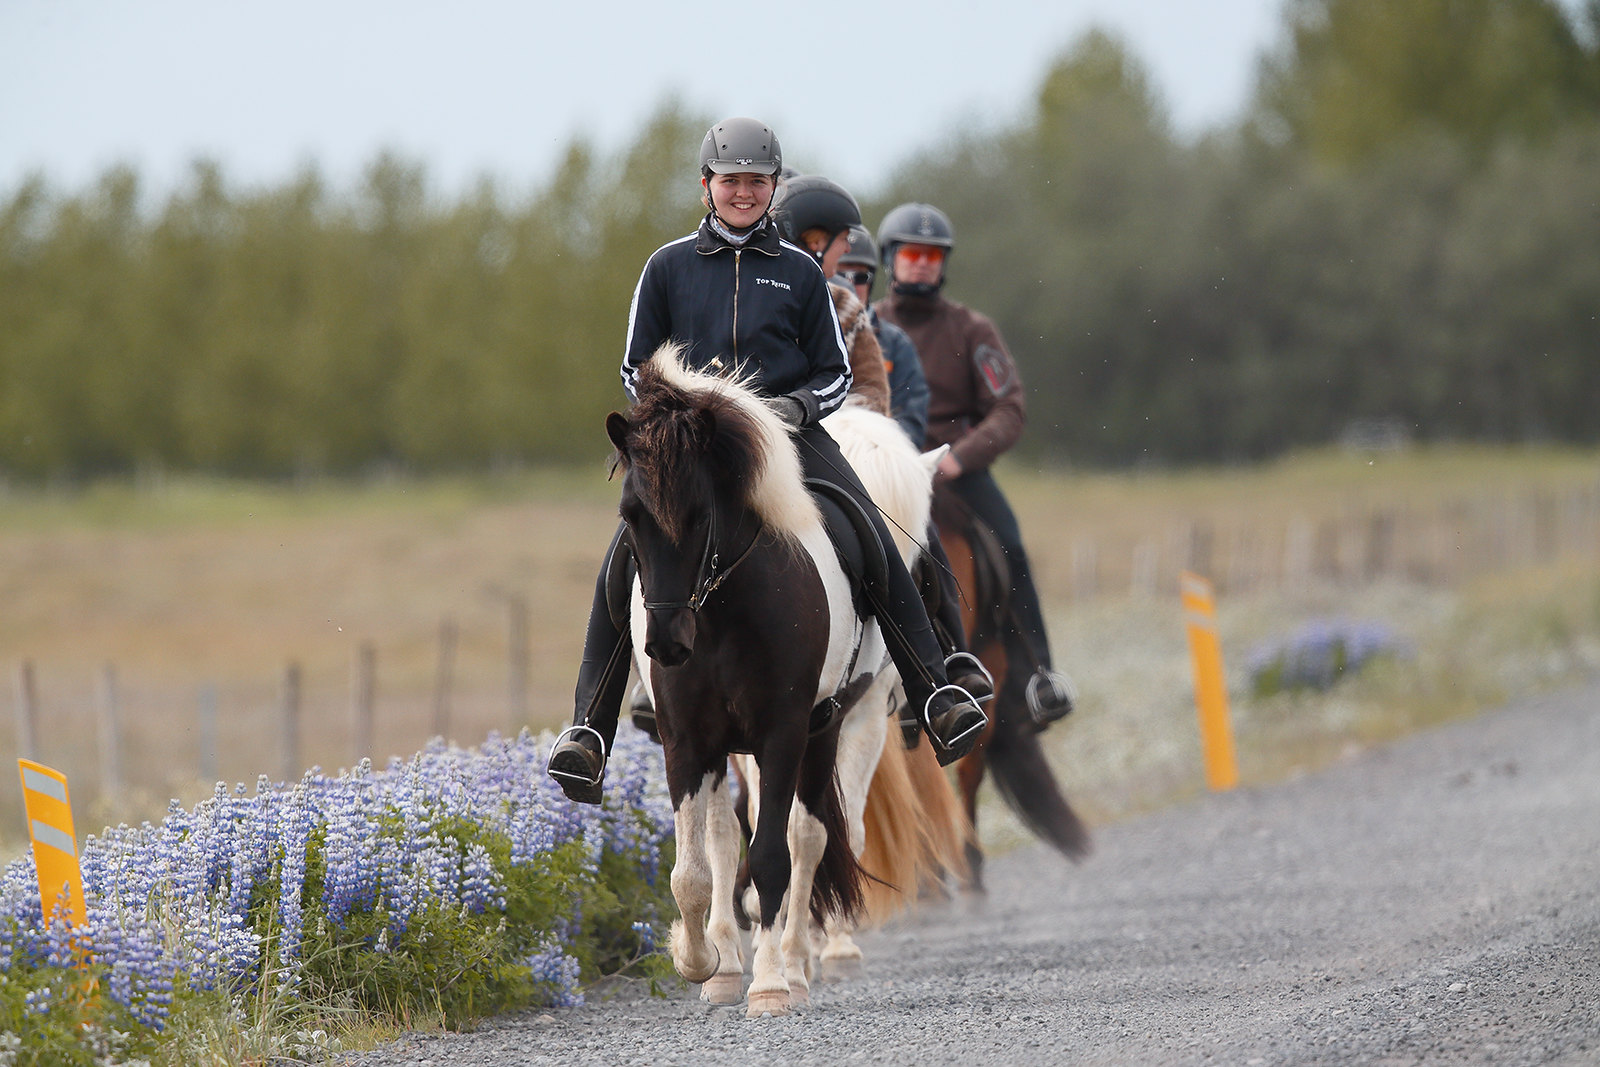 Icelandic Ponies - doing the Tolt